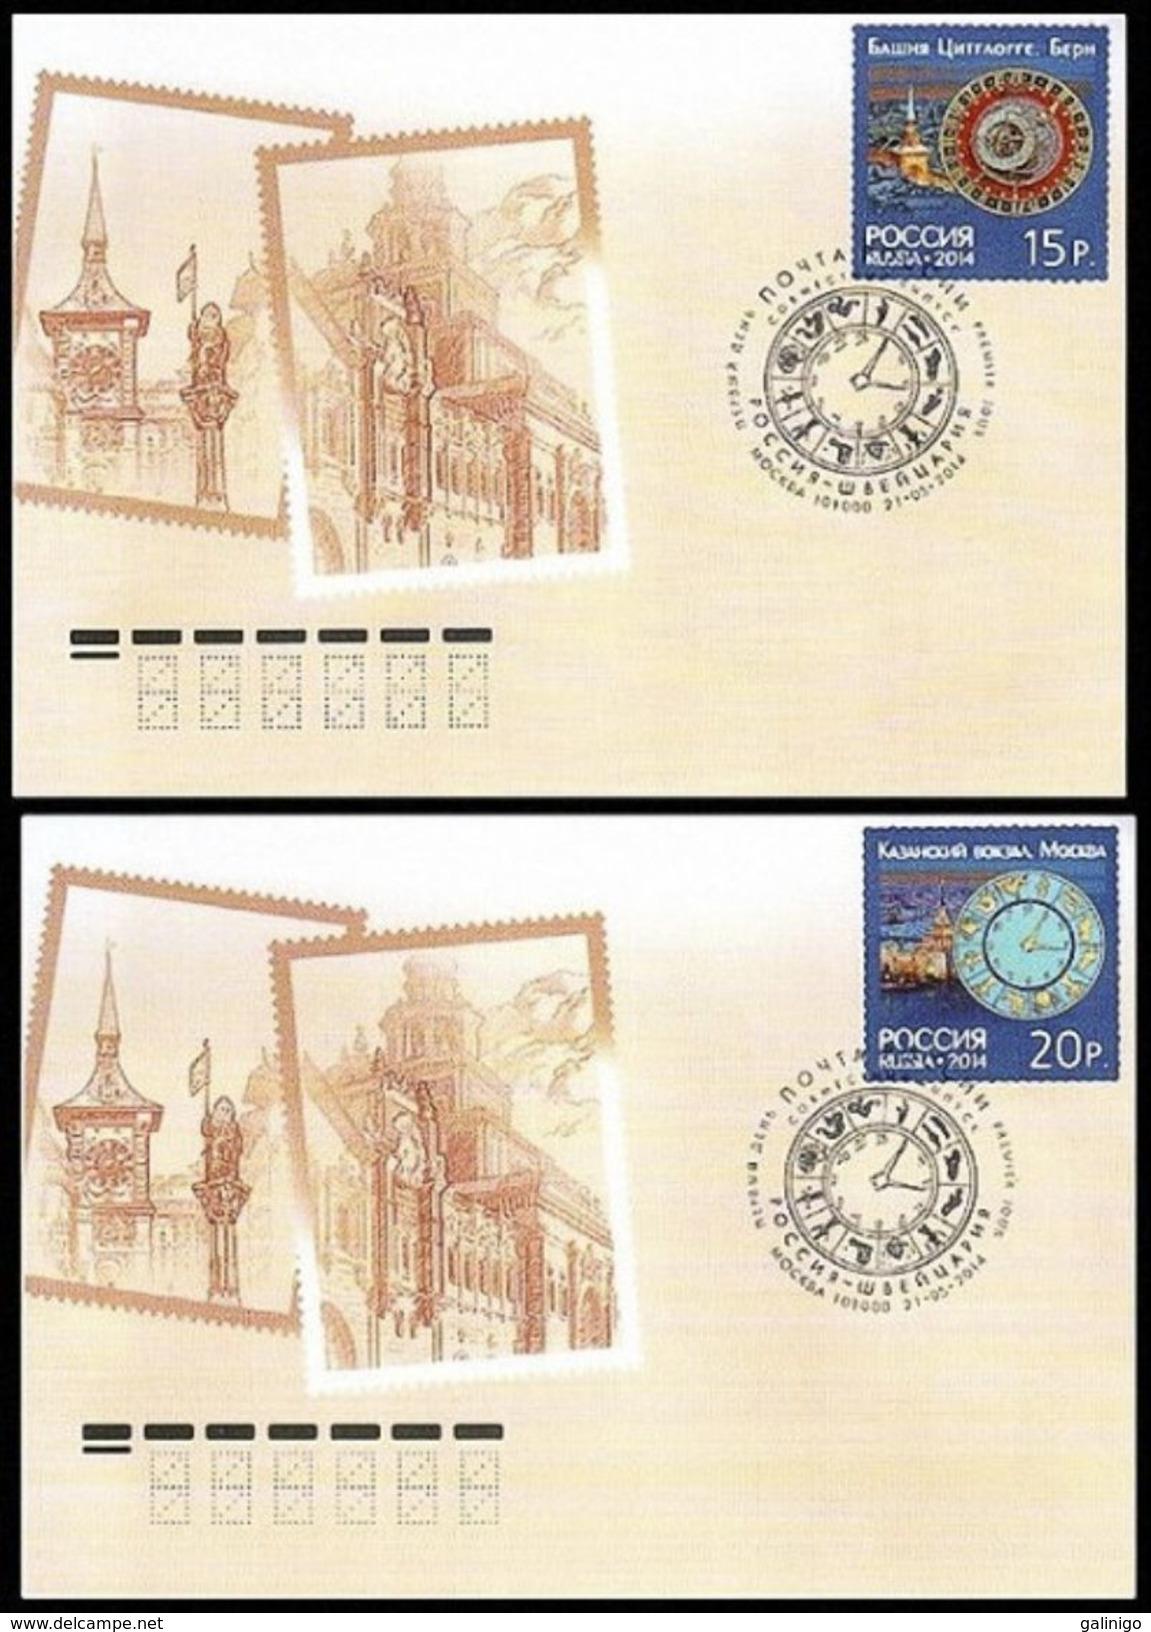 2014 Mi 2043-2044 FDC Canc Moscow Russia Russland Russie Rusia Jont Issues Switzerland Clock Clocks Watch - FDC